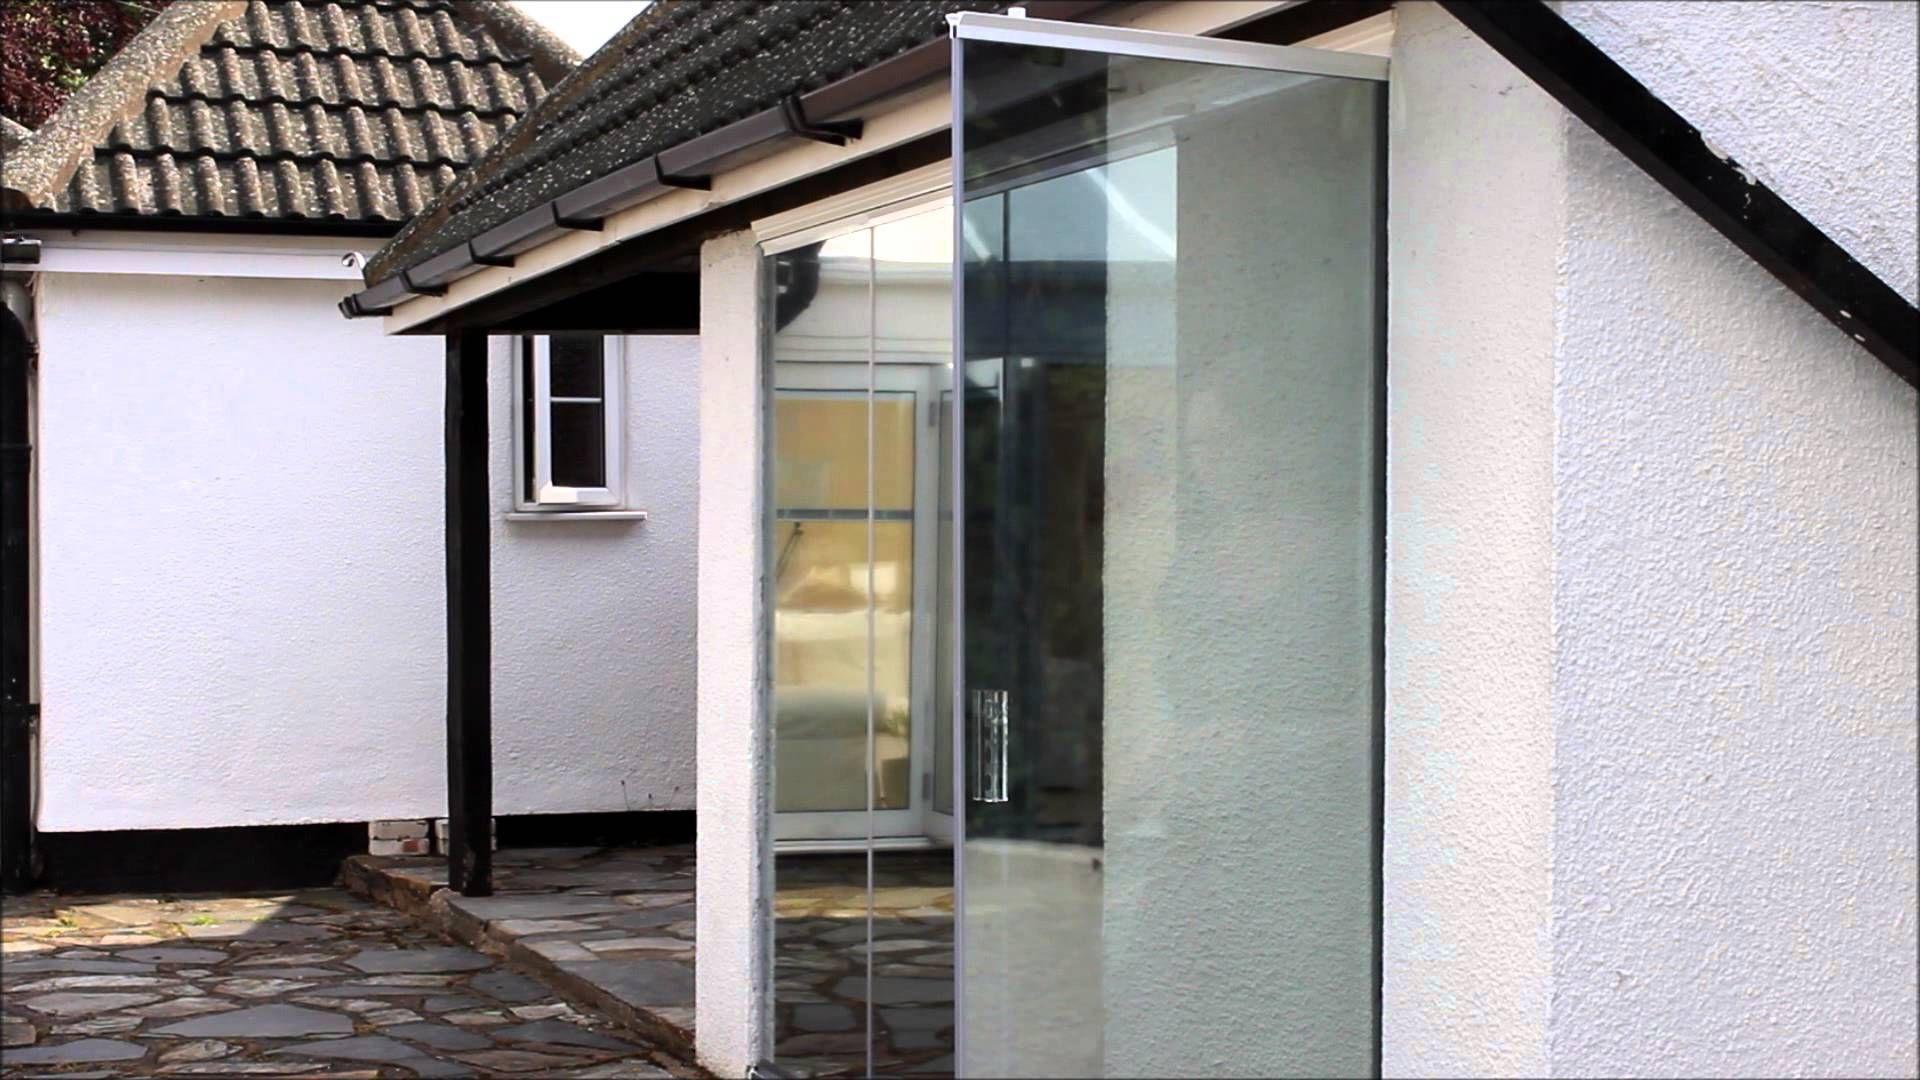 Frameless Glass Doors With One Way Glass 769741007f9b907c8fb39046e953a075 Top Ten Reasons For Choosing Frameless Glass Doors French Doors Interior French Doors